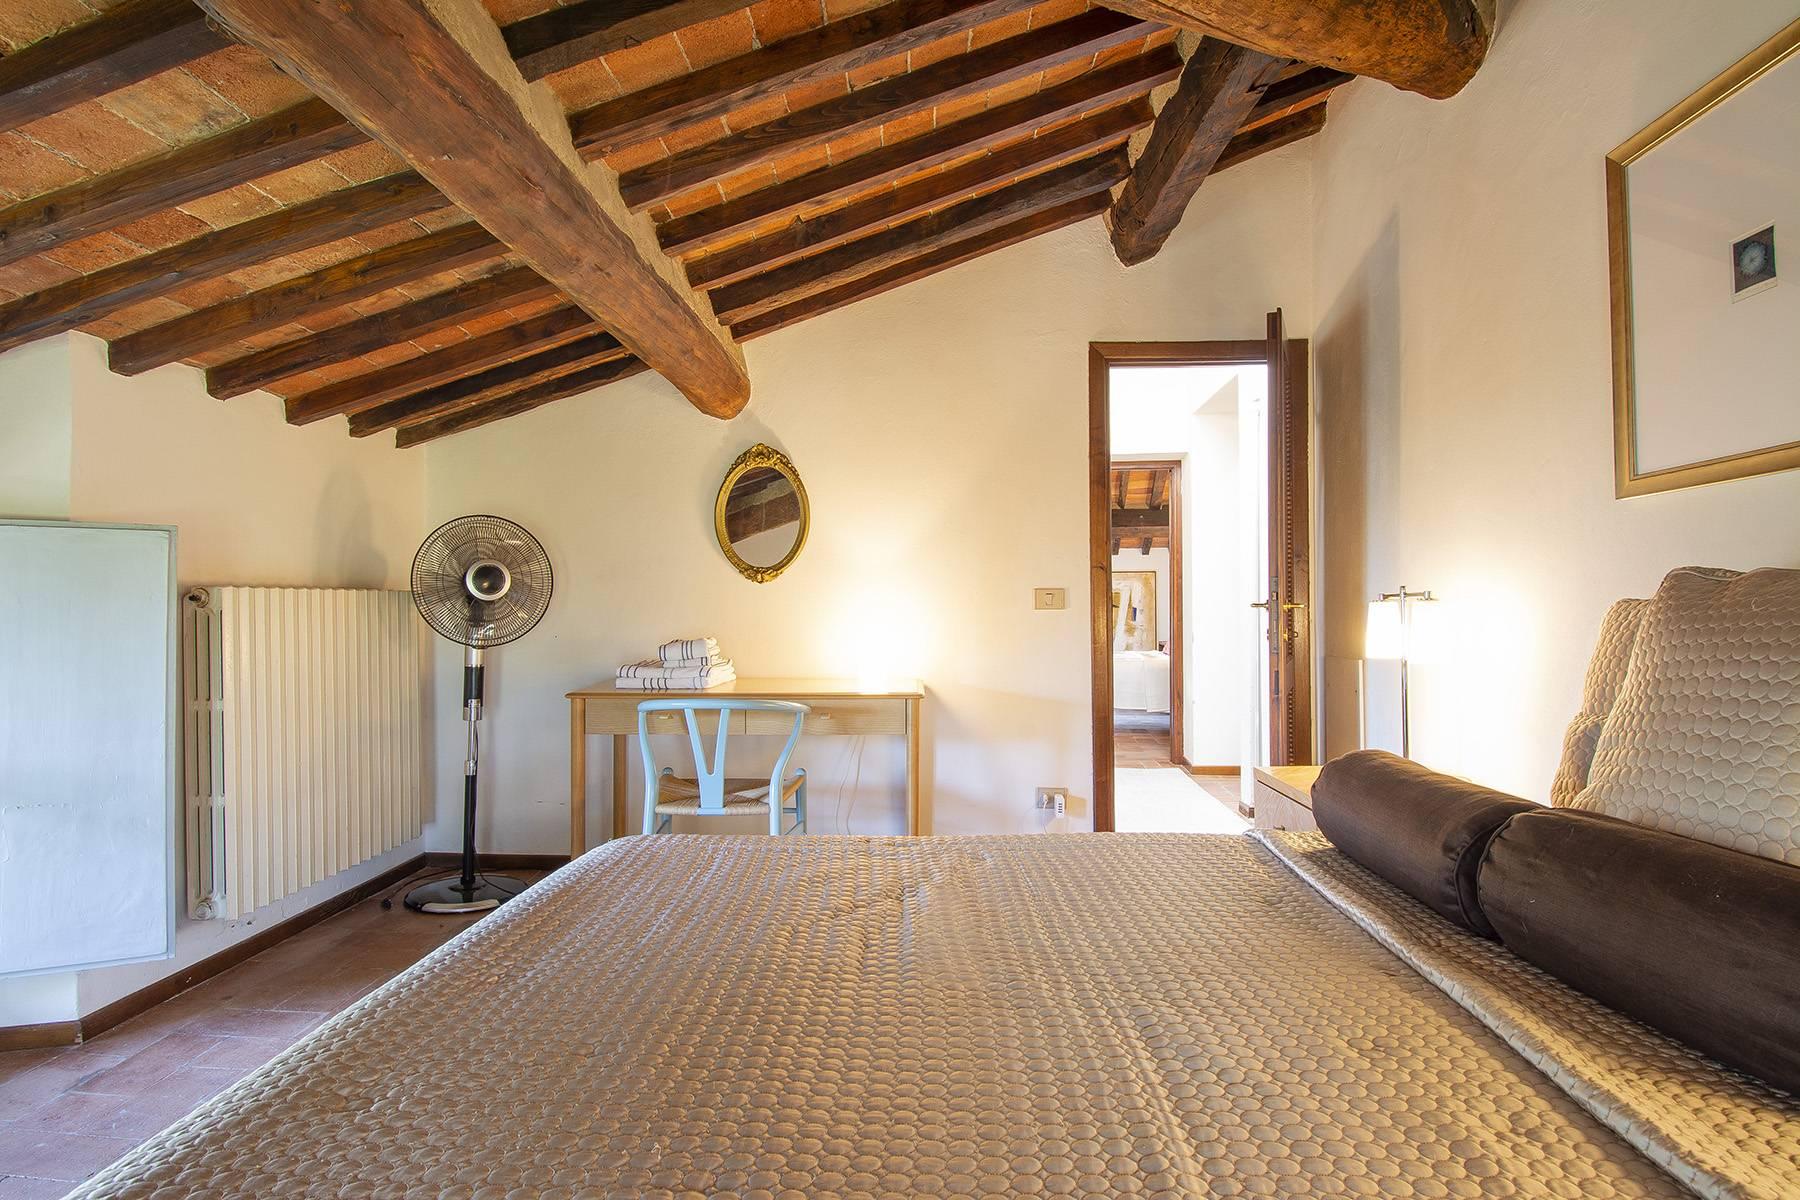 Villa in Vendita a Capannori: 5 locali, 380 mq - Foto 22